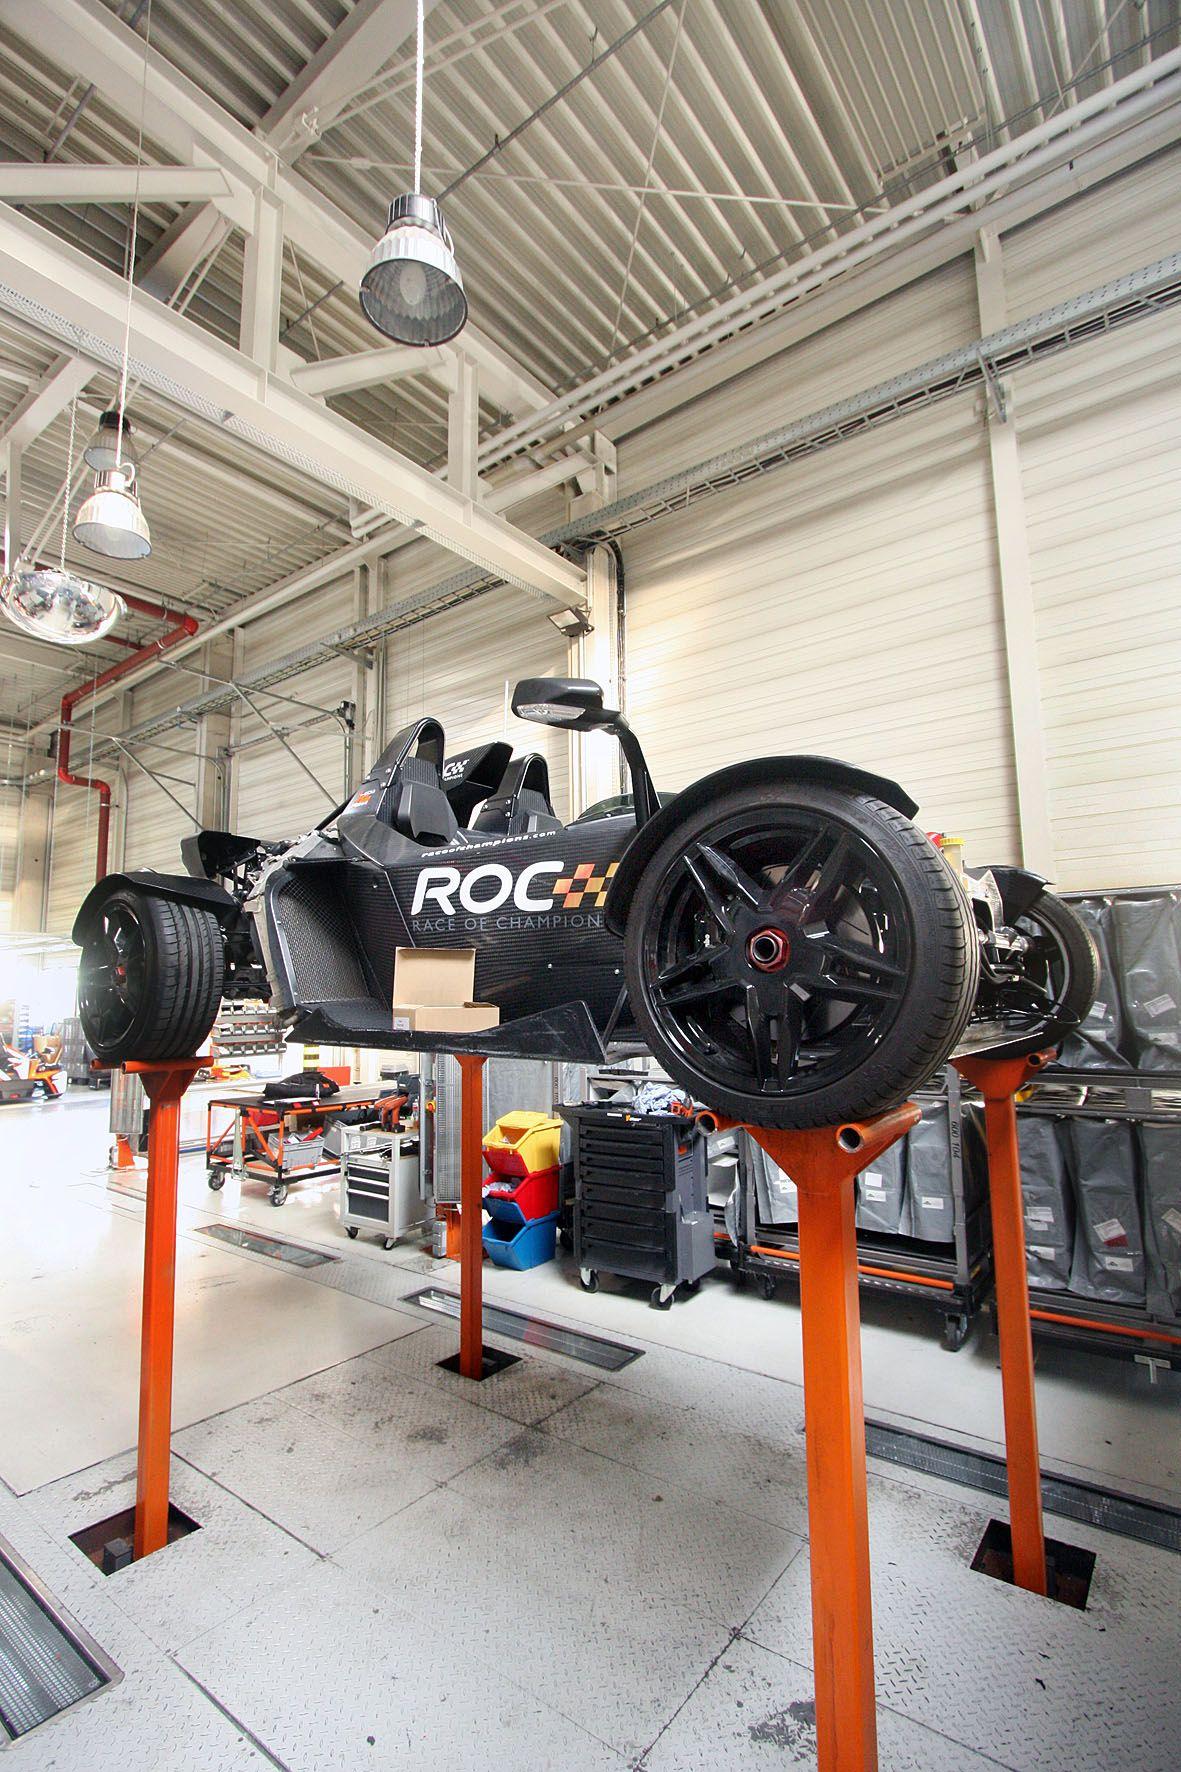 KTM X-Bow protagonista della Race of Champions